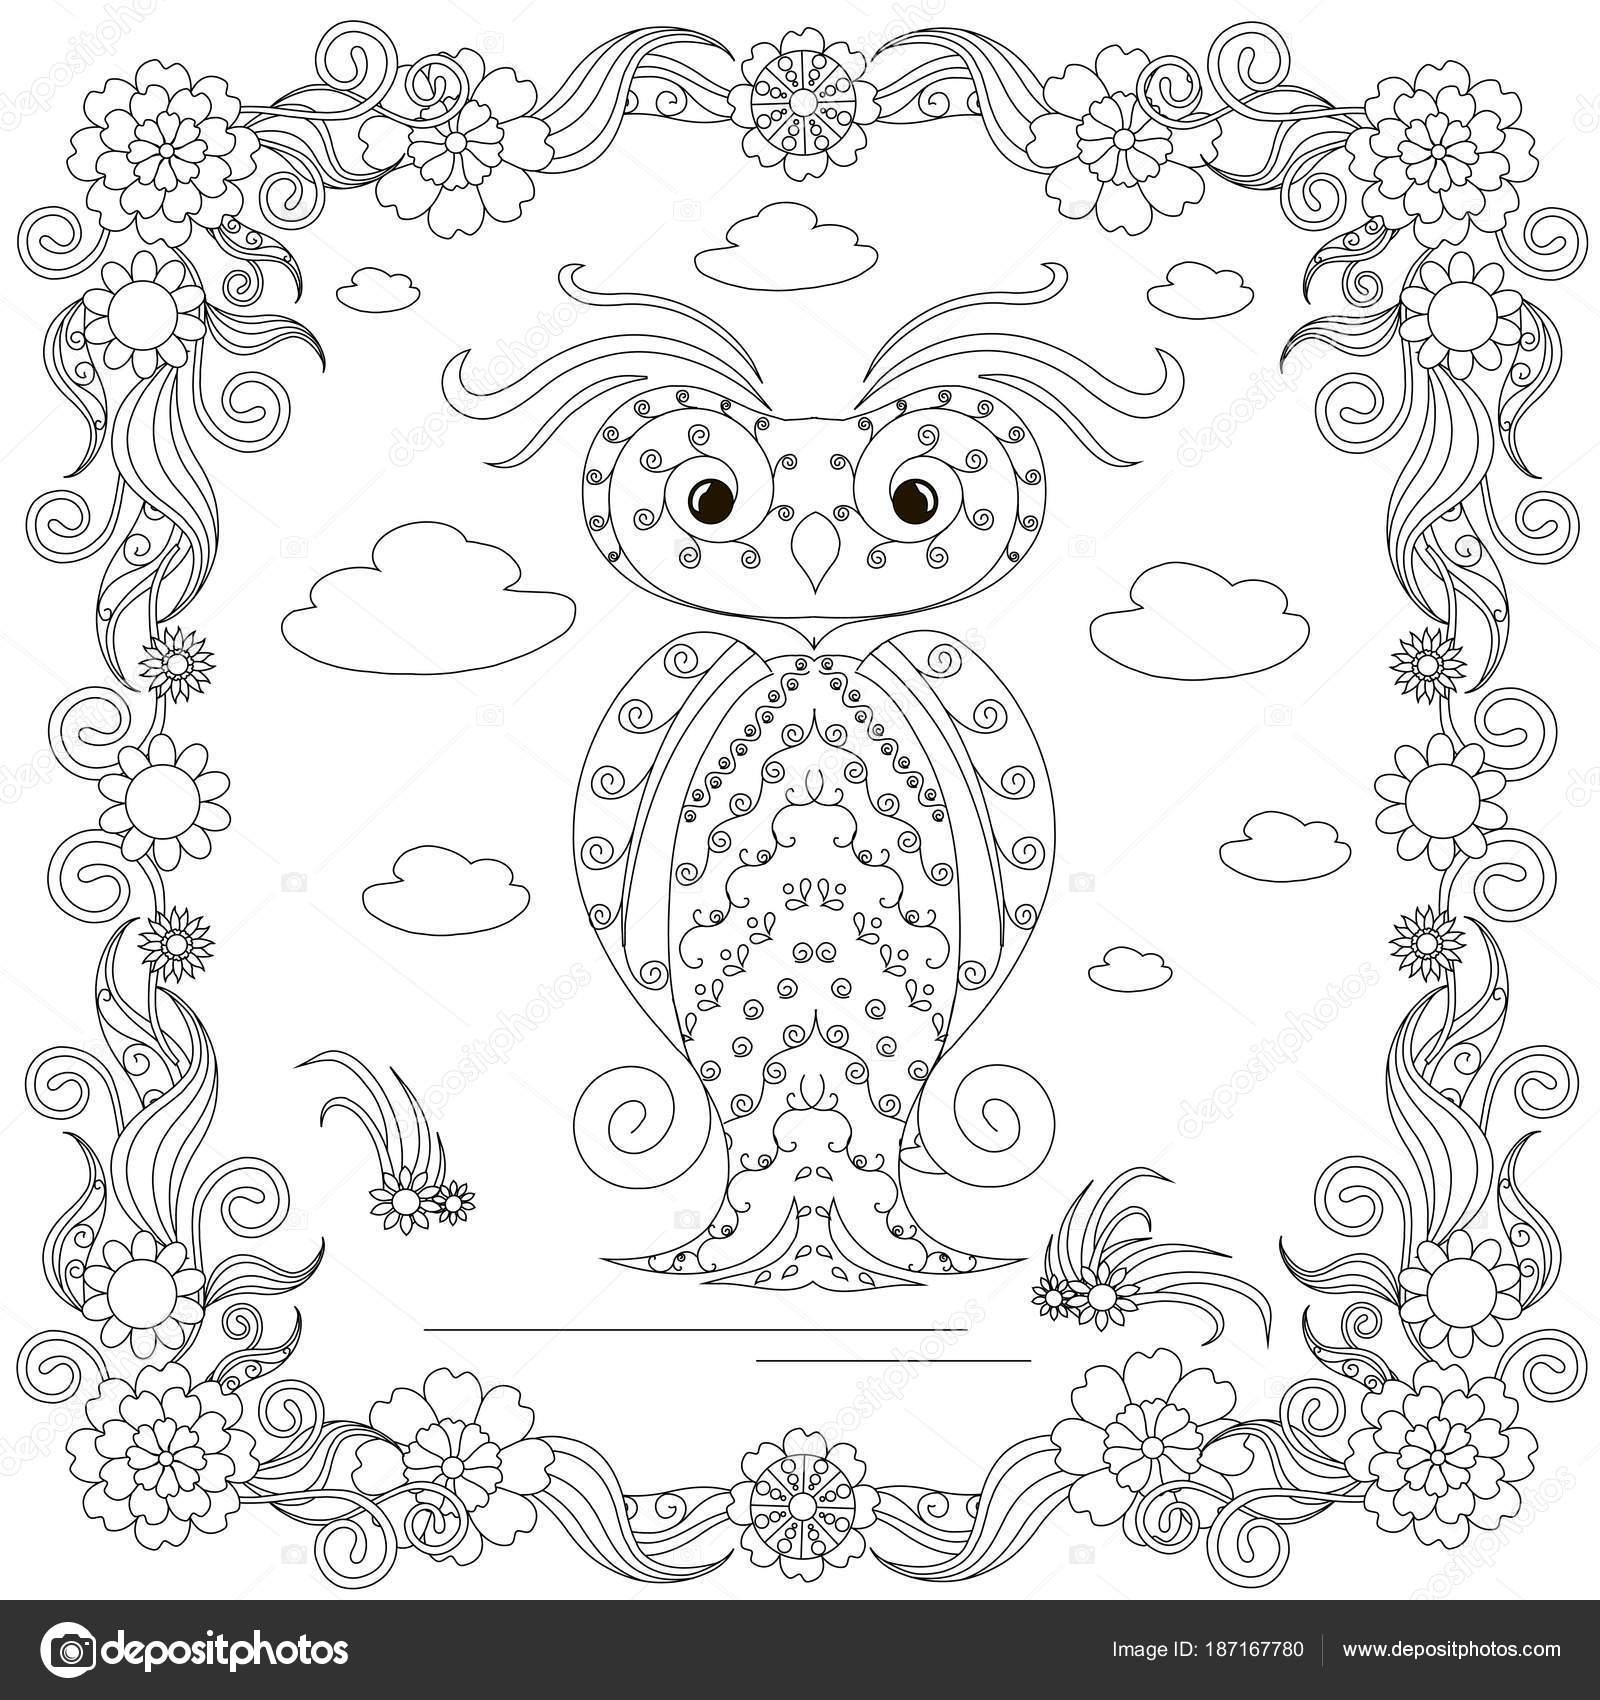 Zentangle Stil Eule Blume Rahmen Monochrome Skizze Färbung Seite ...